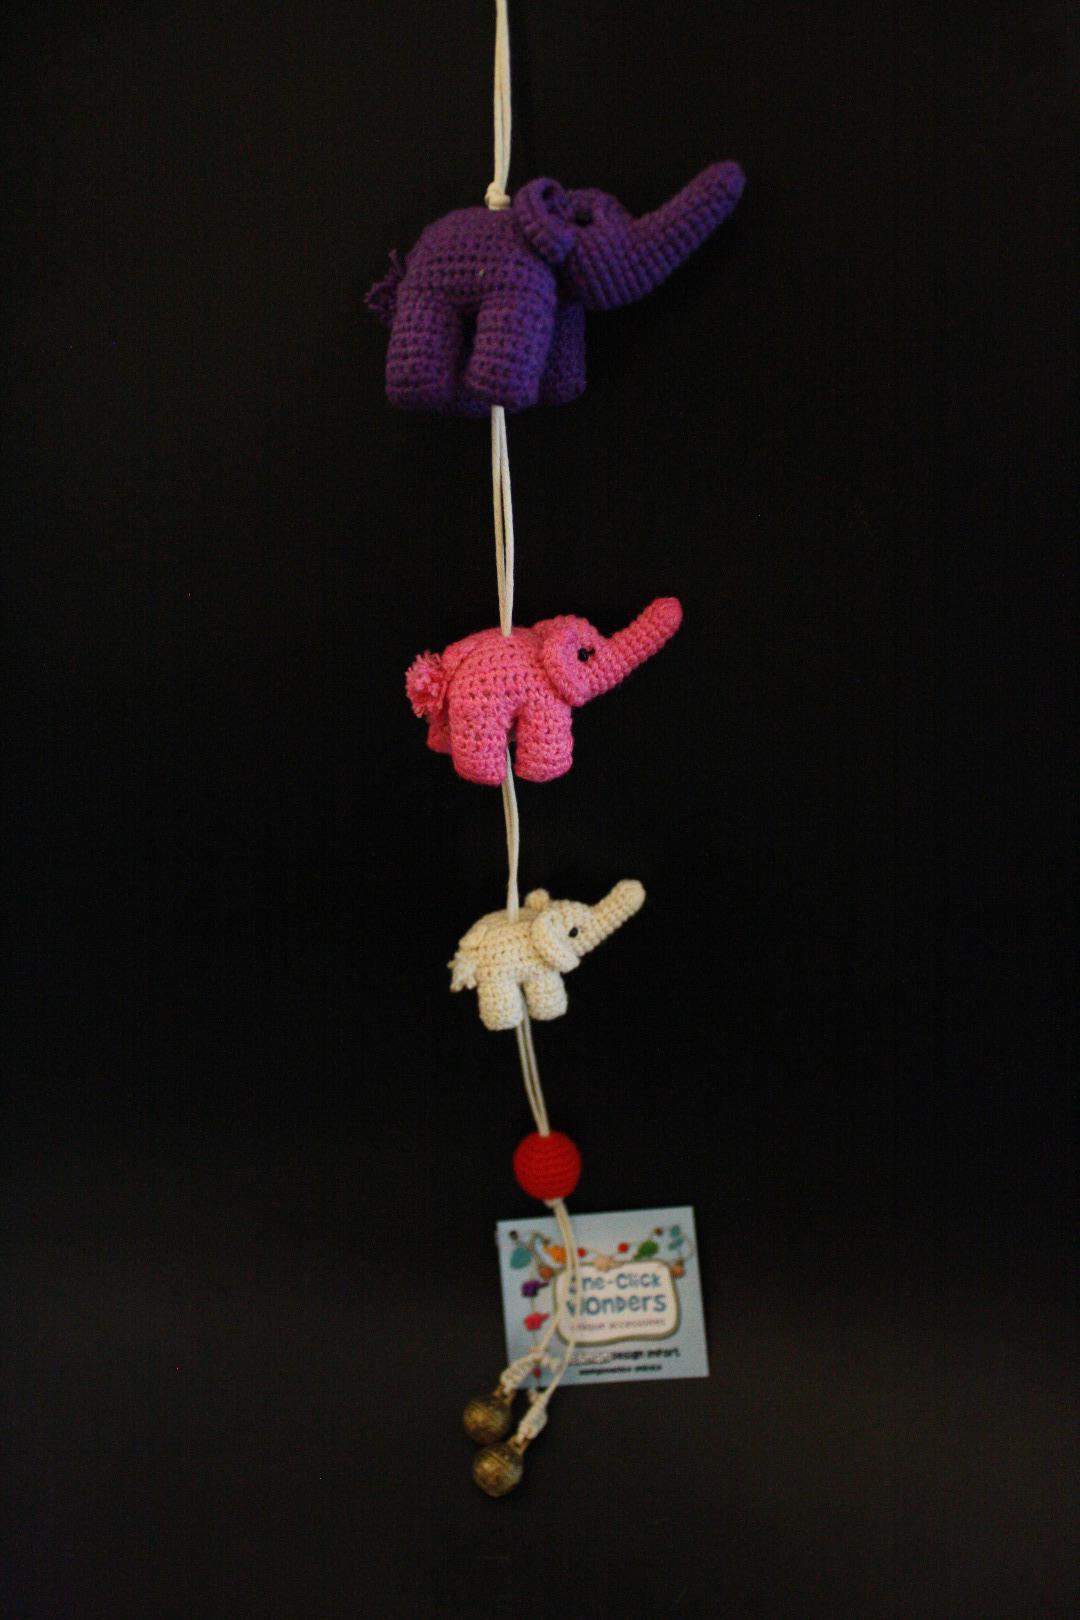 ONE-CLICK WONDERS Mobilé Häkelelefanten lila pink 50 cm - 4